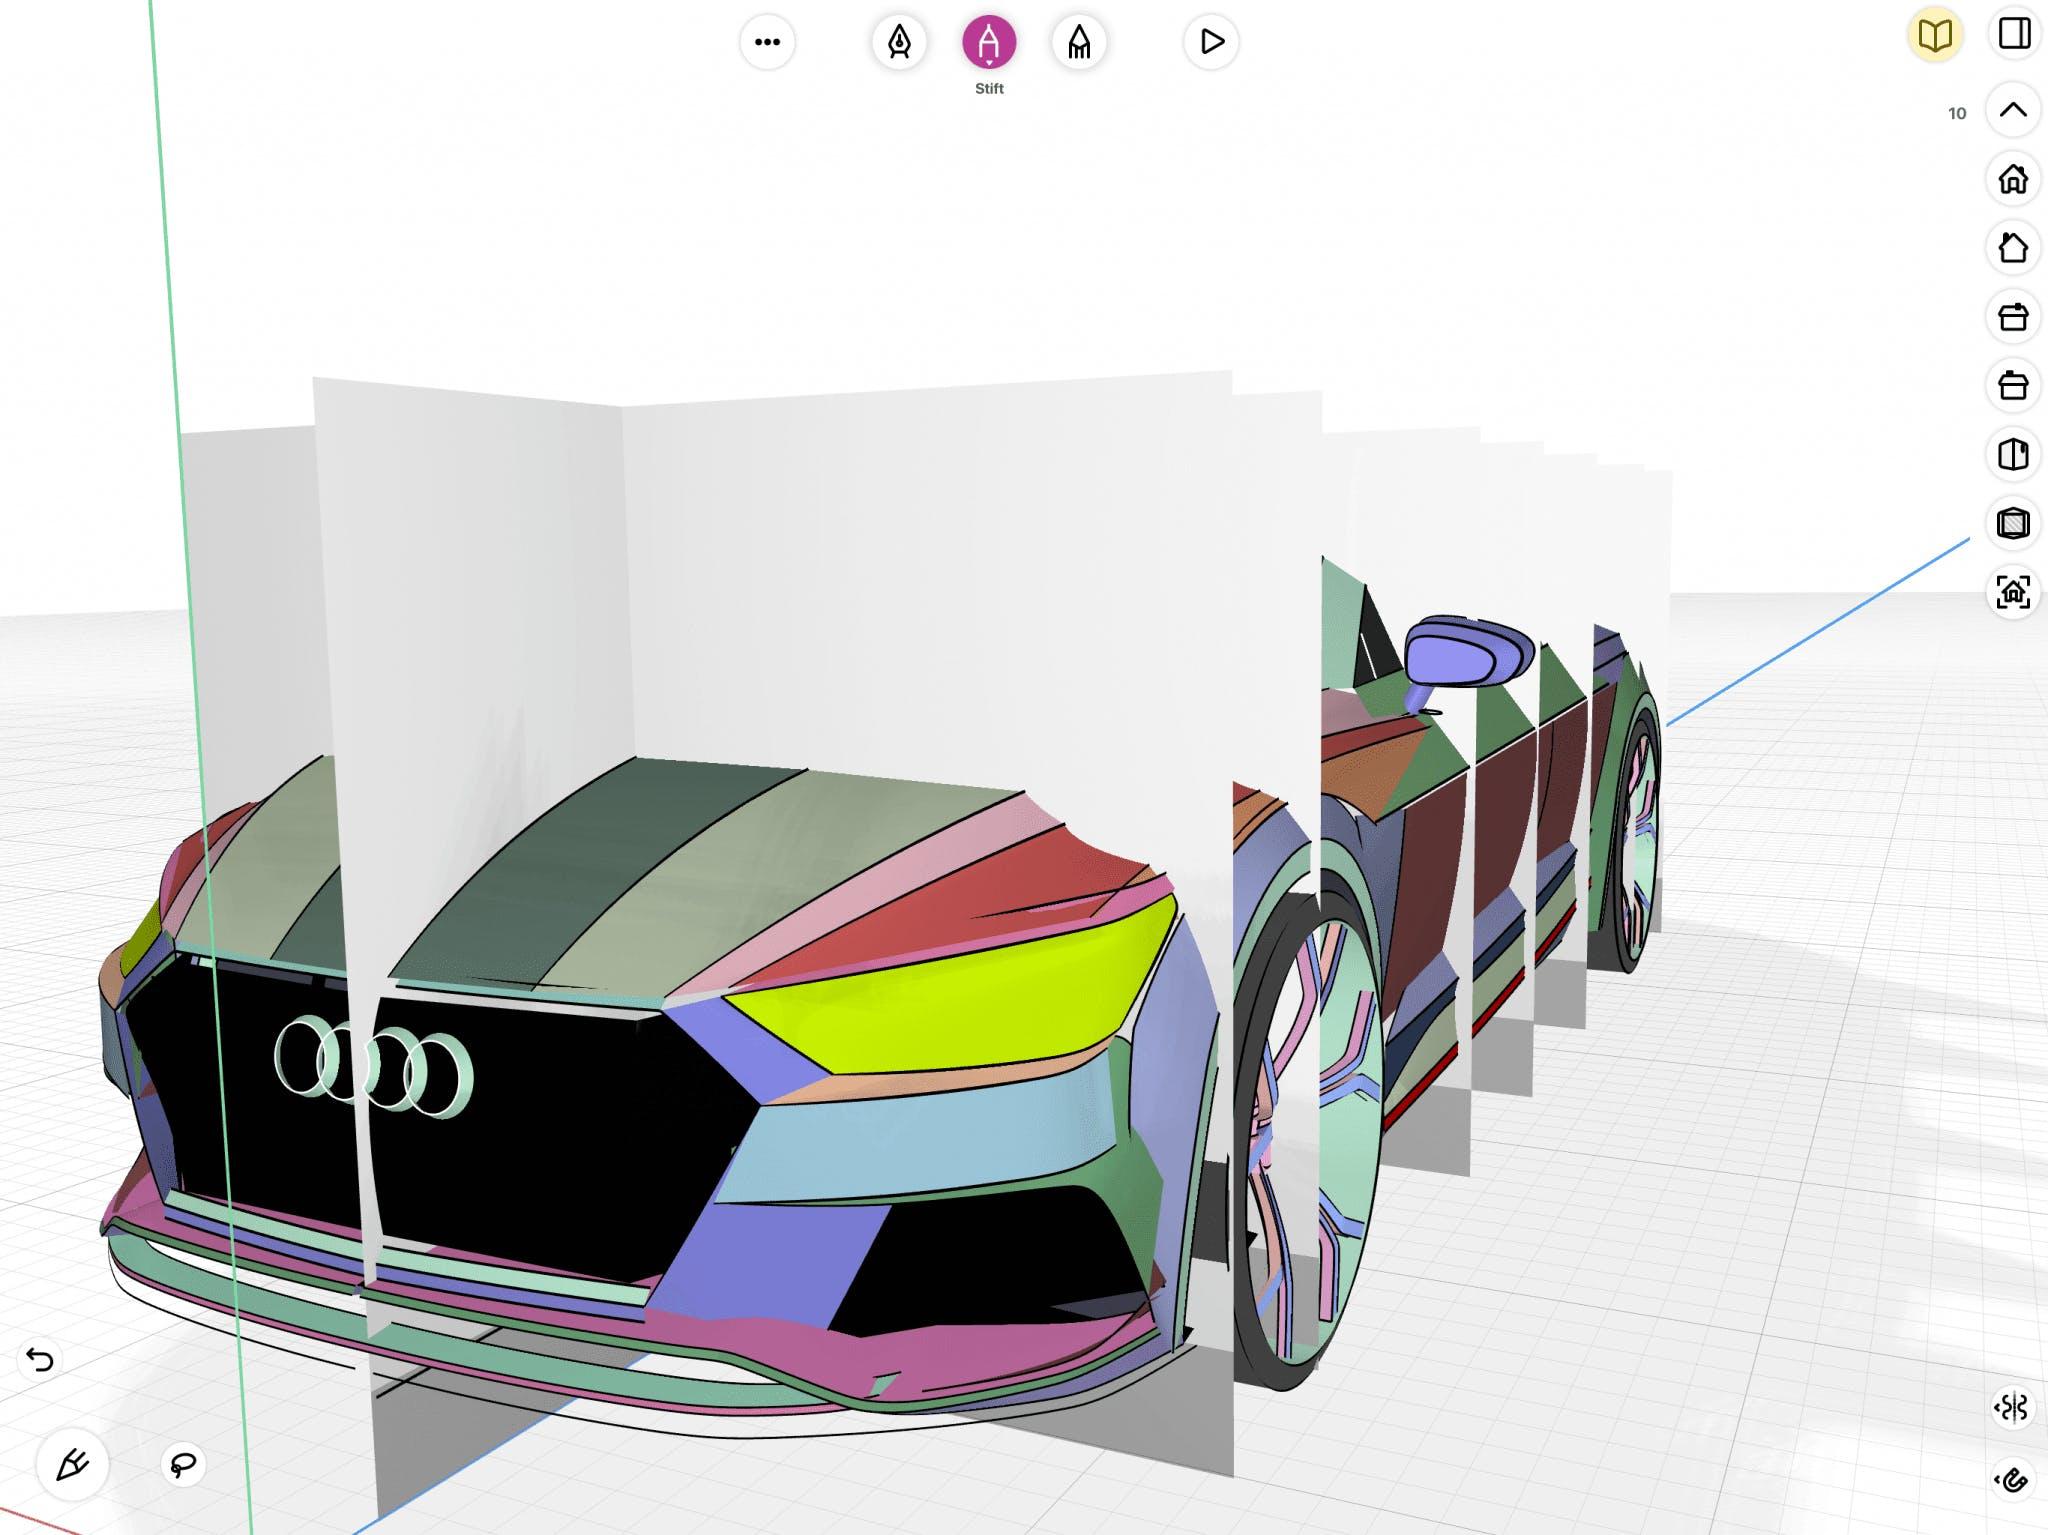 Aleksander Dietrich - Automative surfaces based modeling